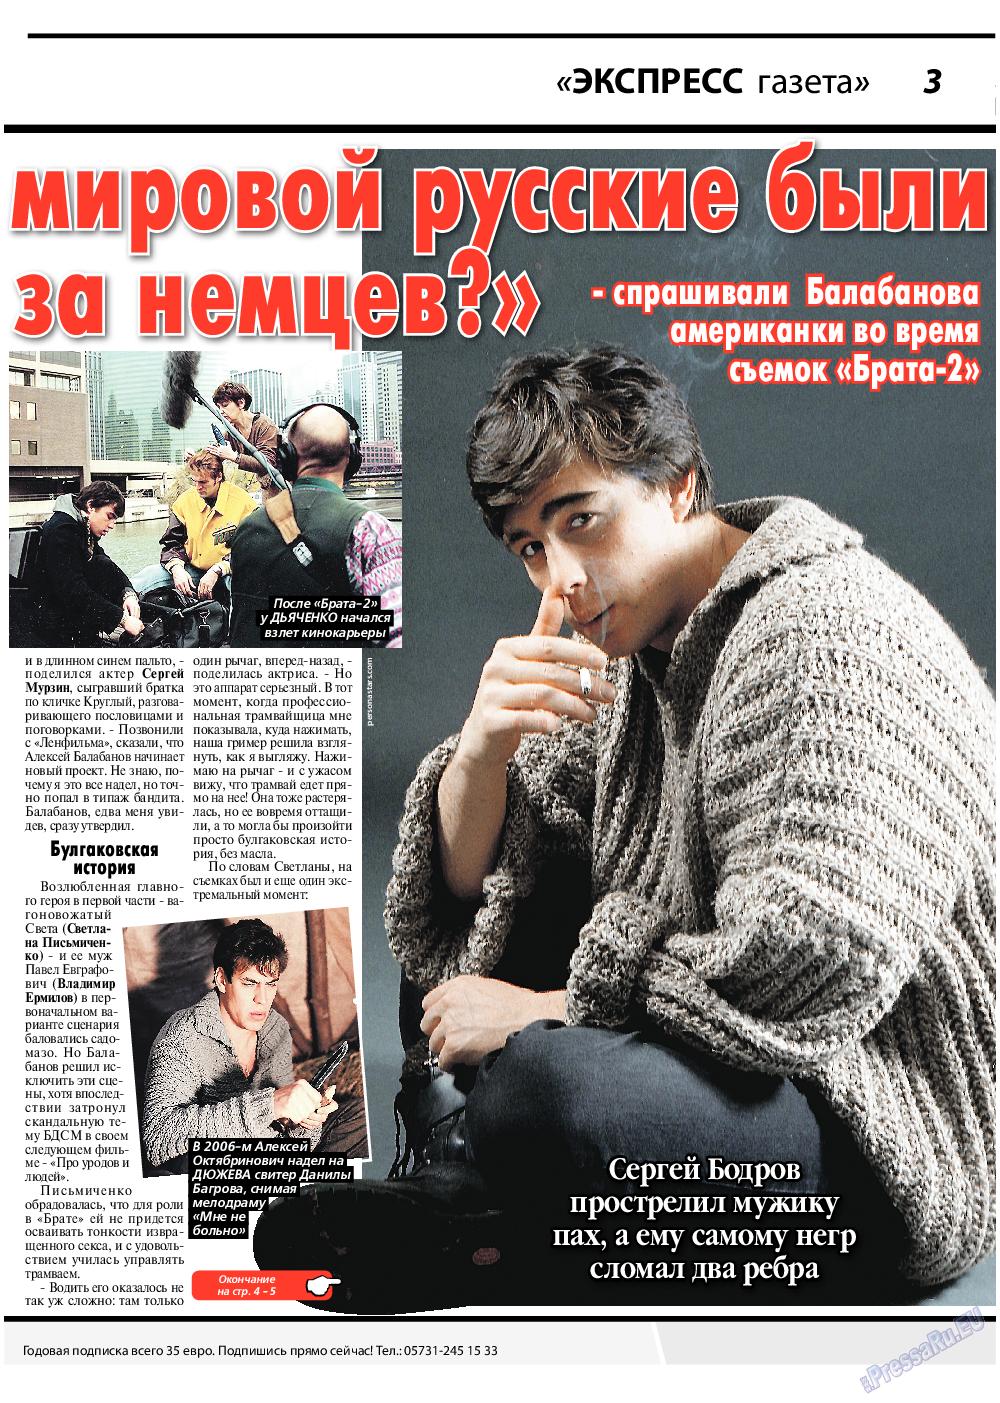 Экспресс газета (газета). 2020 год, номер 4, стр. 3